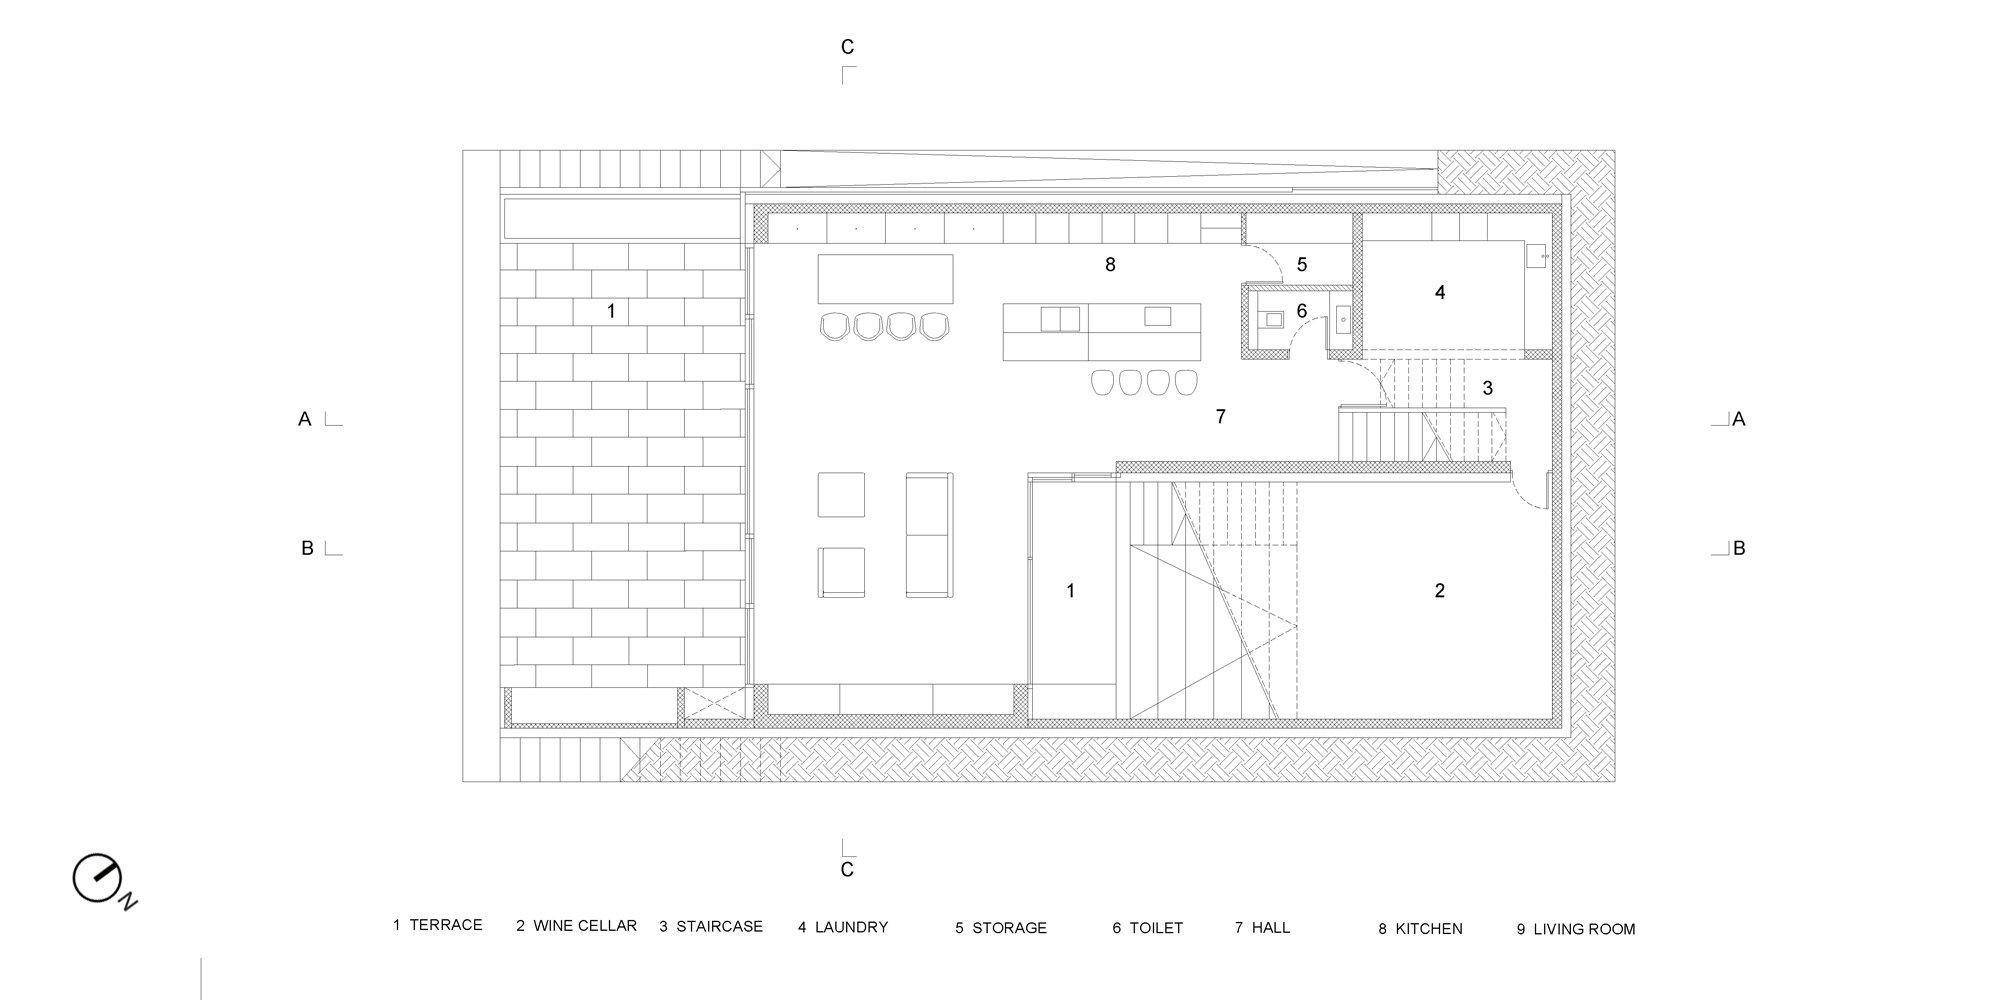 Underground floor plan © OFIS architekti